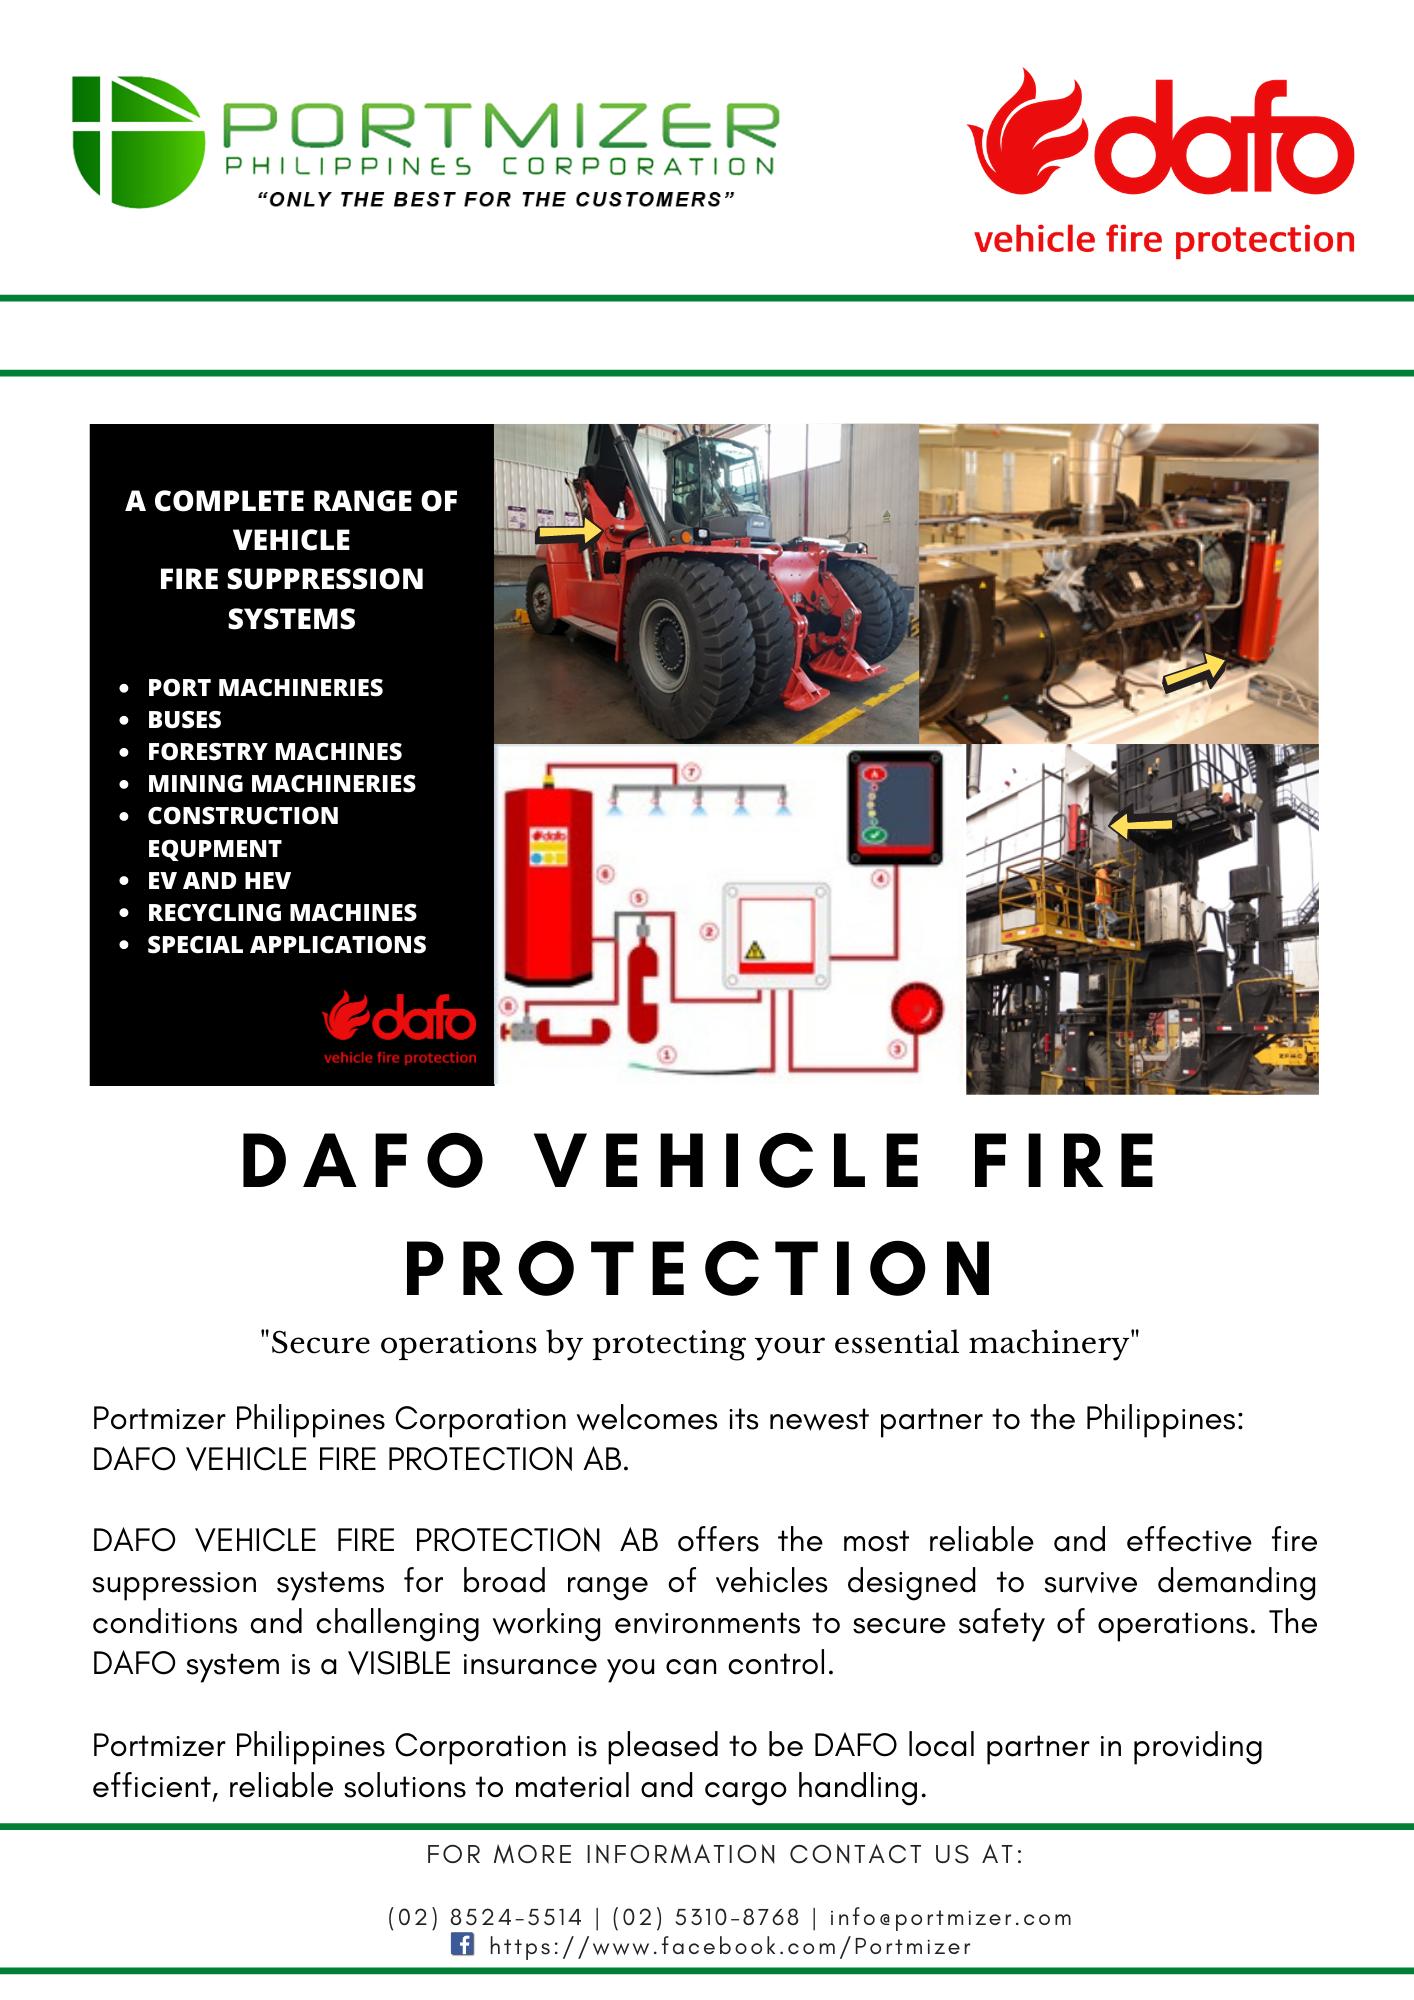 Portmizer_DAFO email newsletter